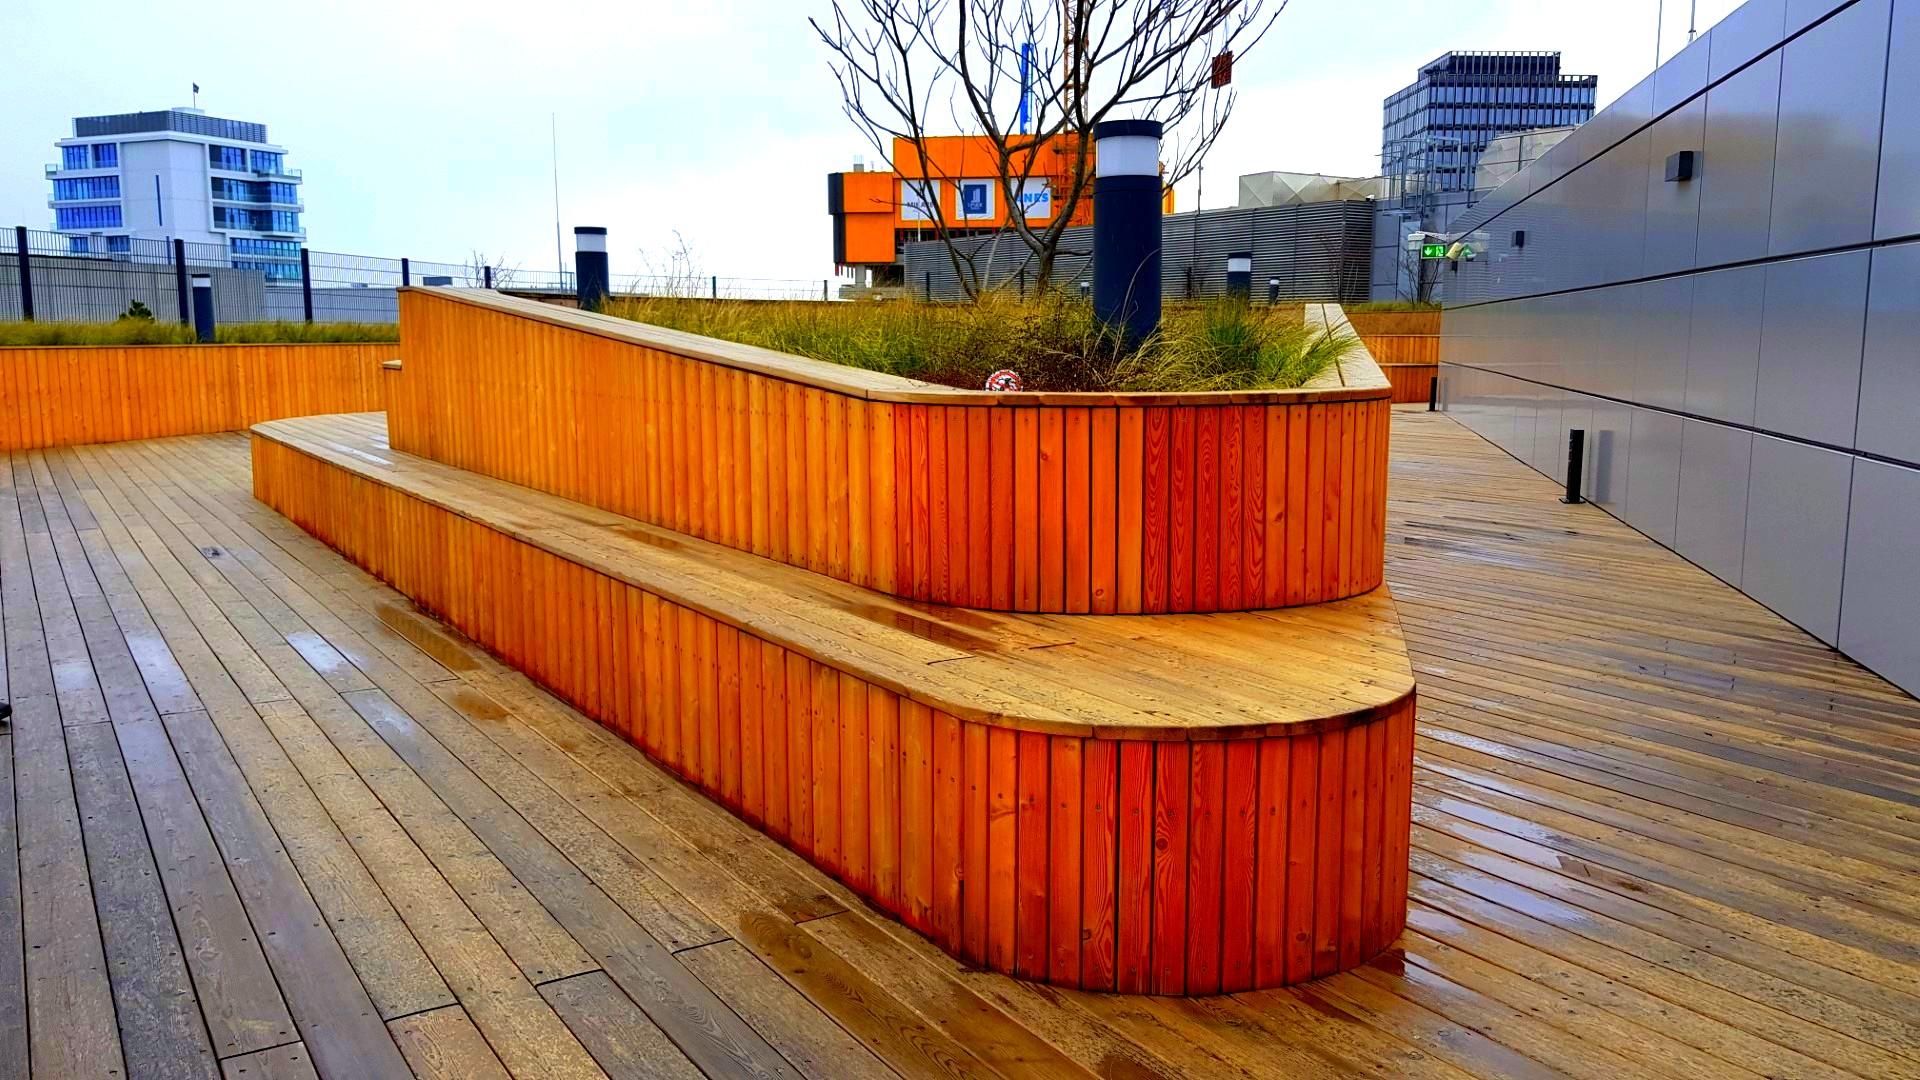 Holz Terrassenbau Berlin – Wir bauen Holzterrassen in Berlin